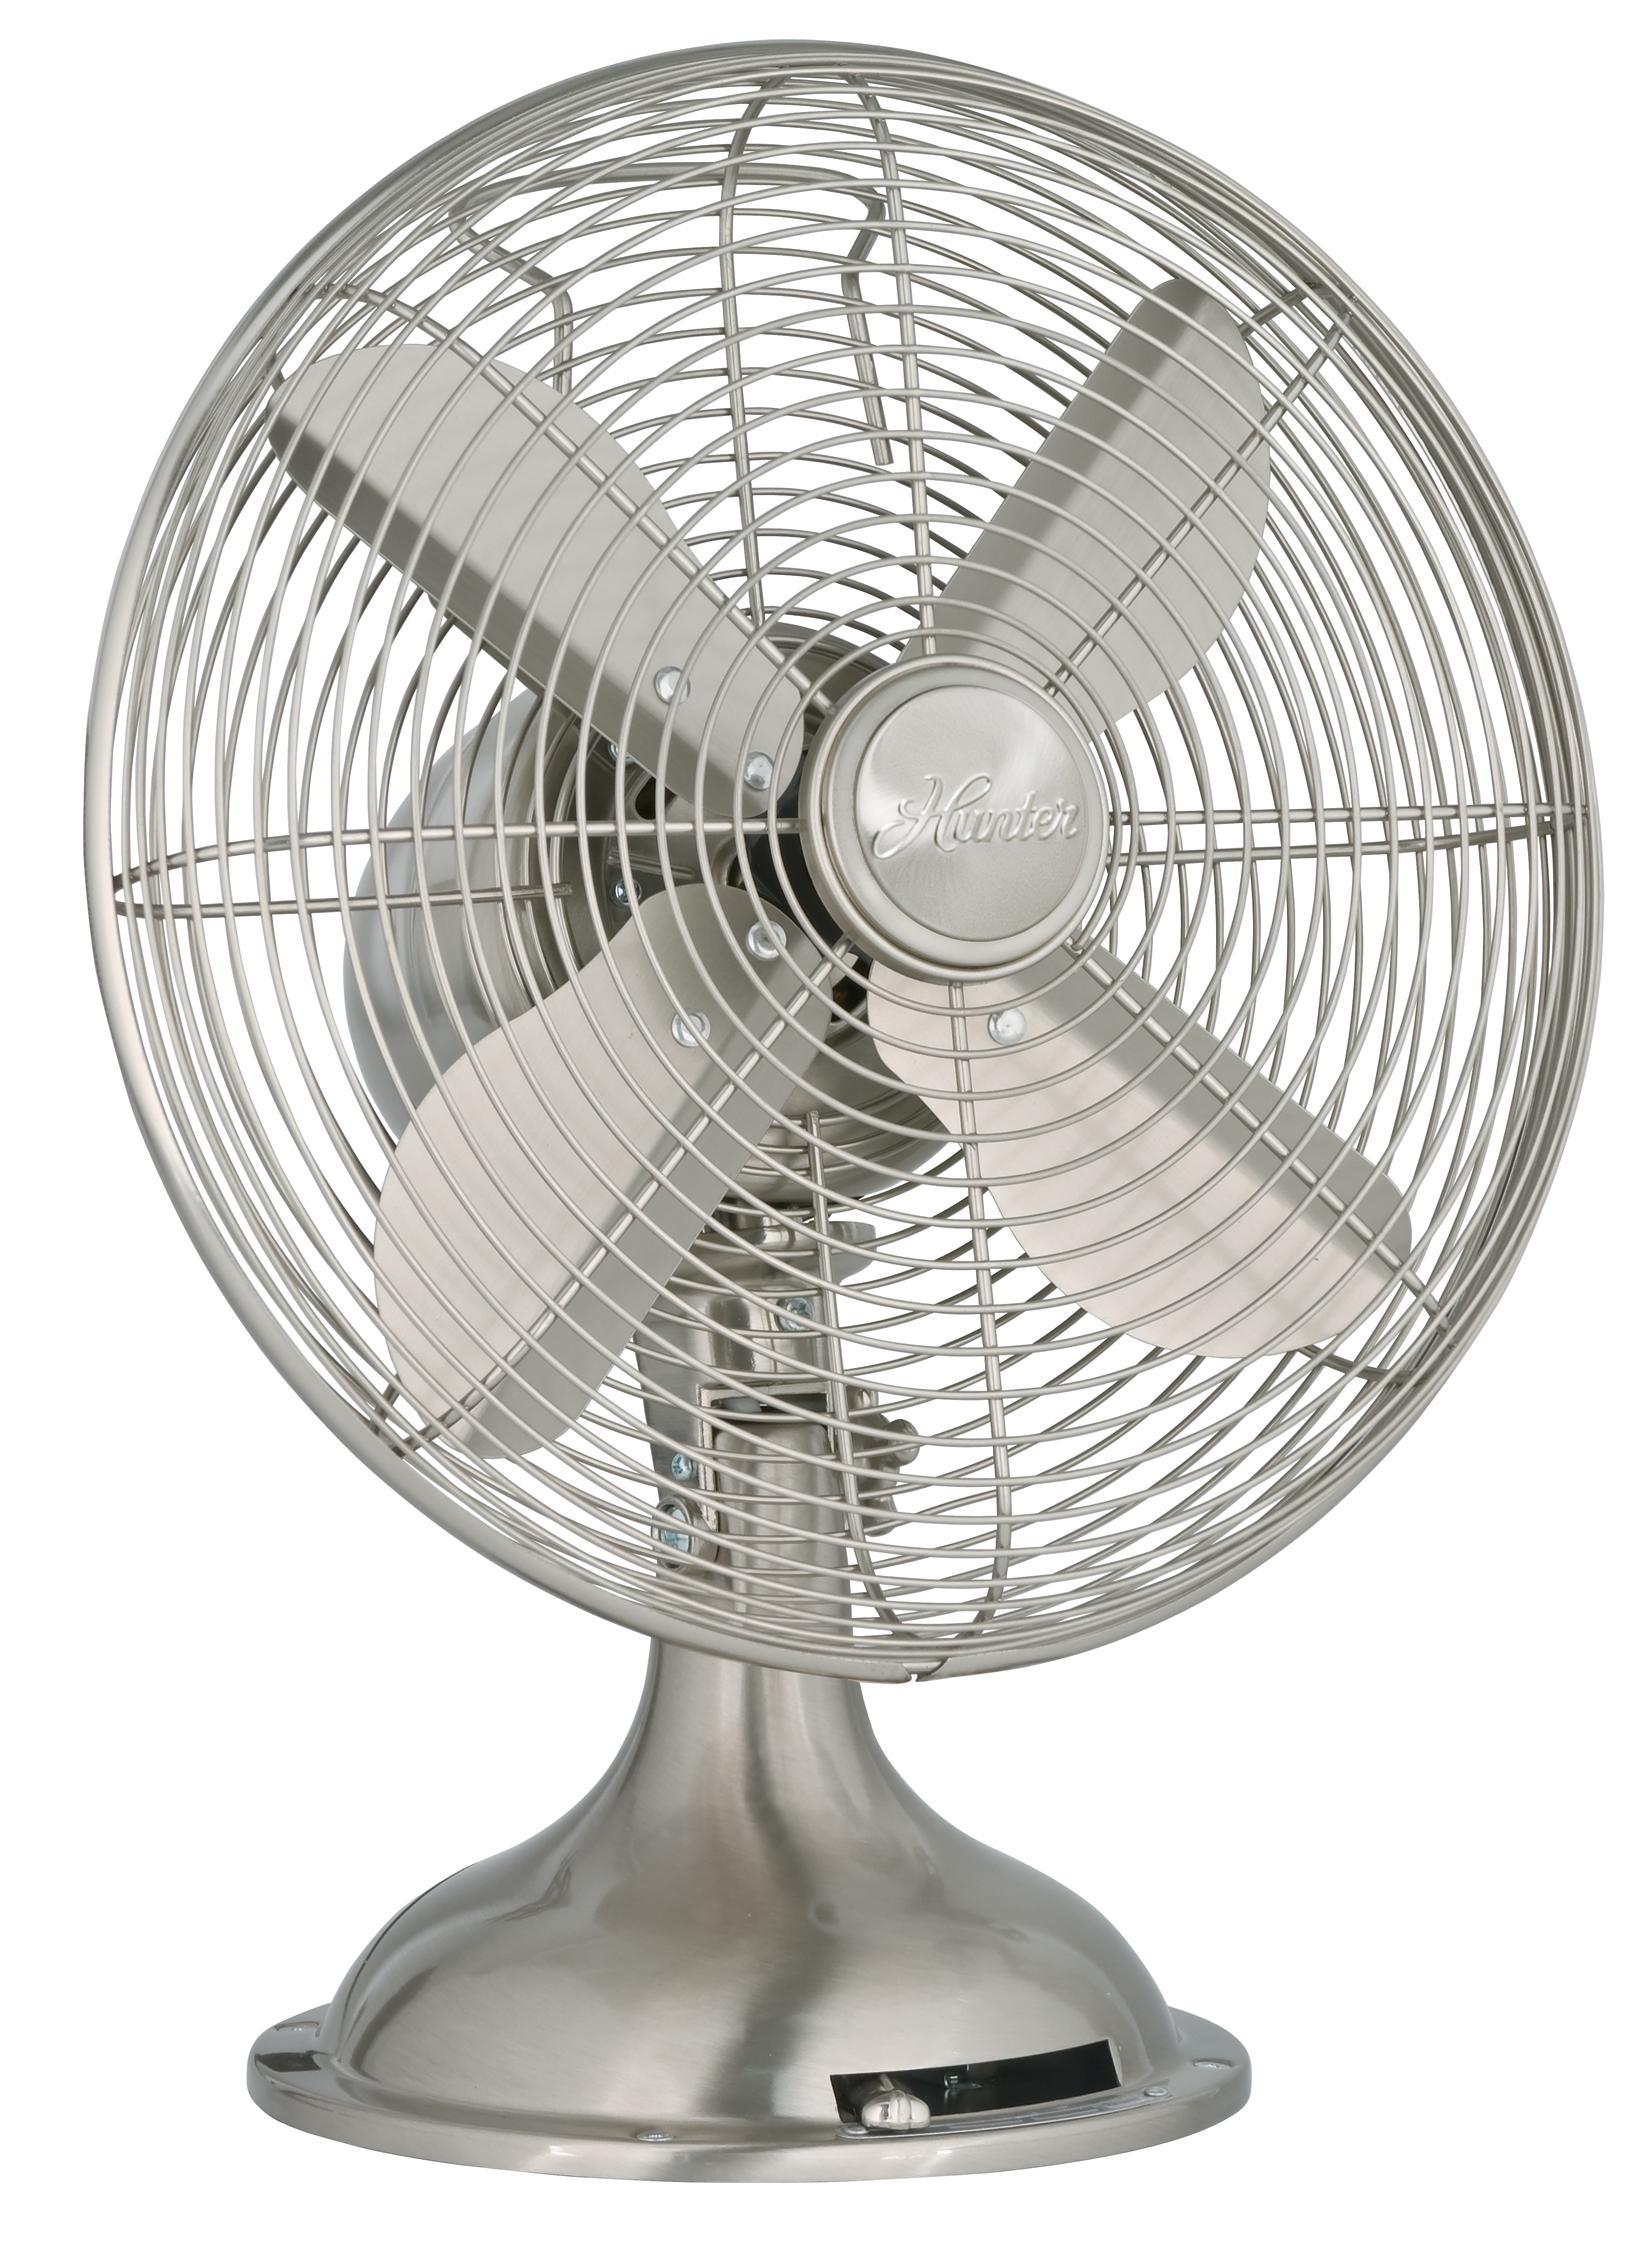 Table Top Oscillating Fan : Amazon hunter quot metal fan brushed nickel